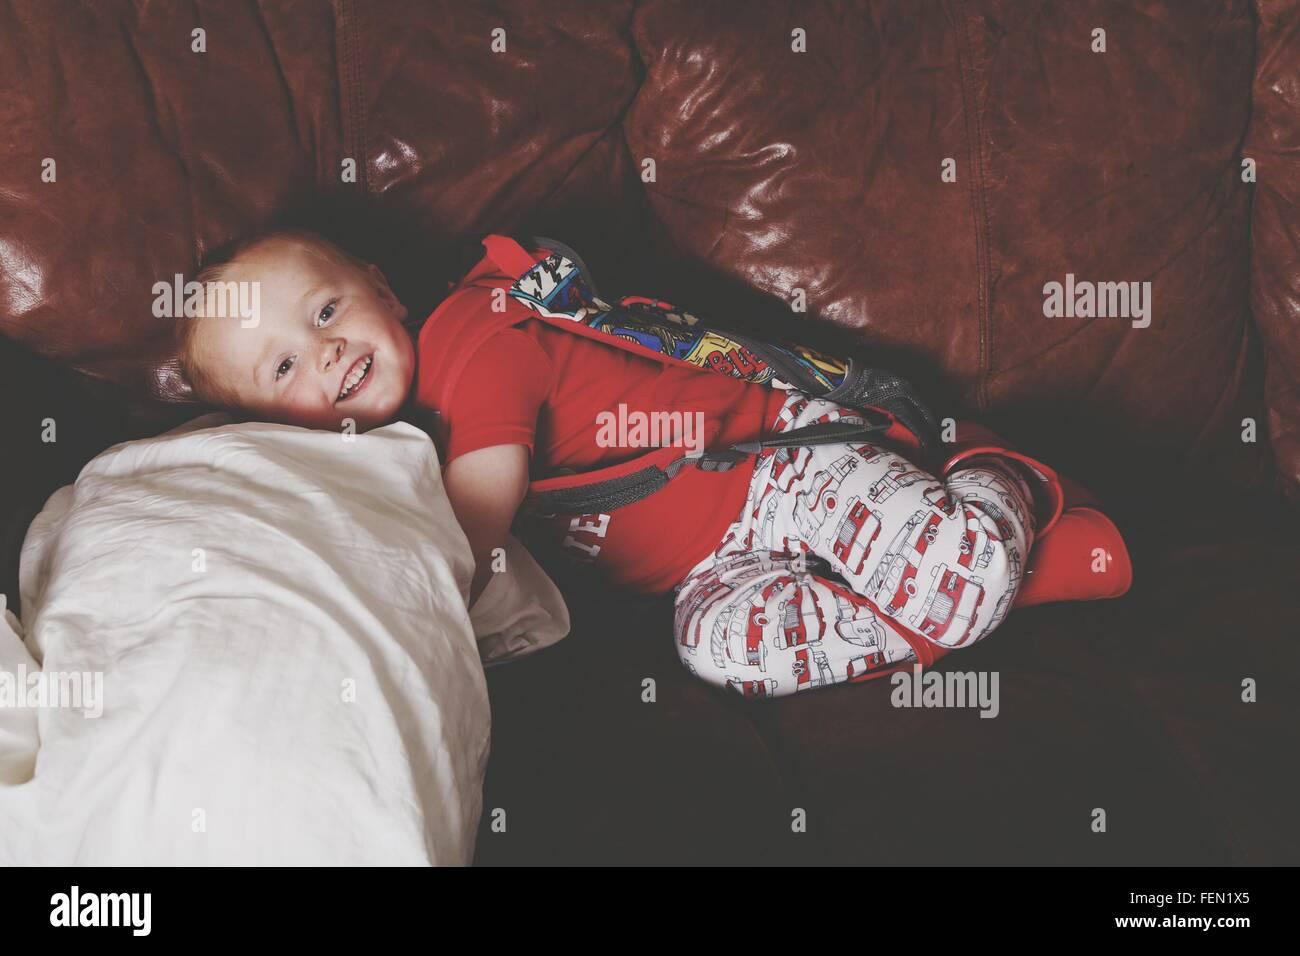 Boy Lying On Sofa And Smiling - Stock Image